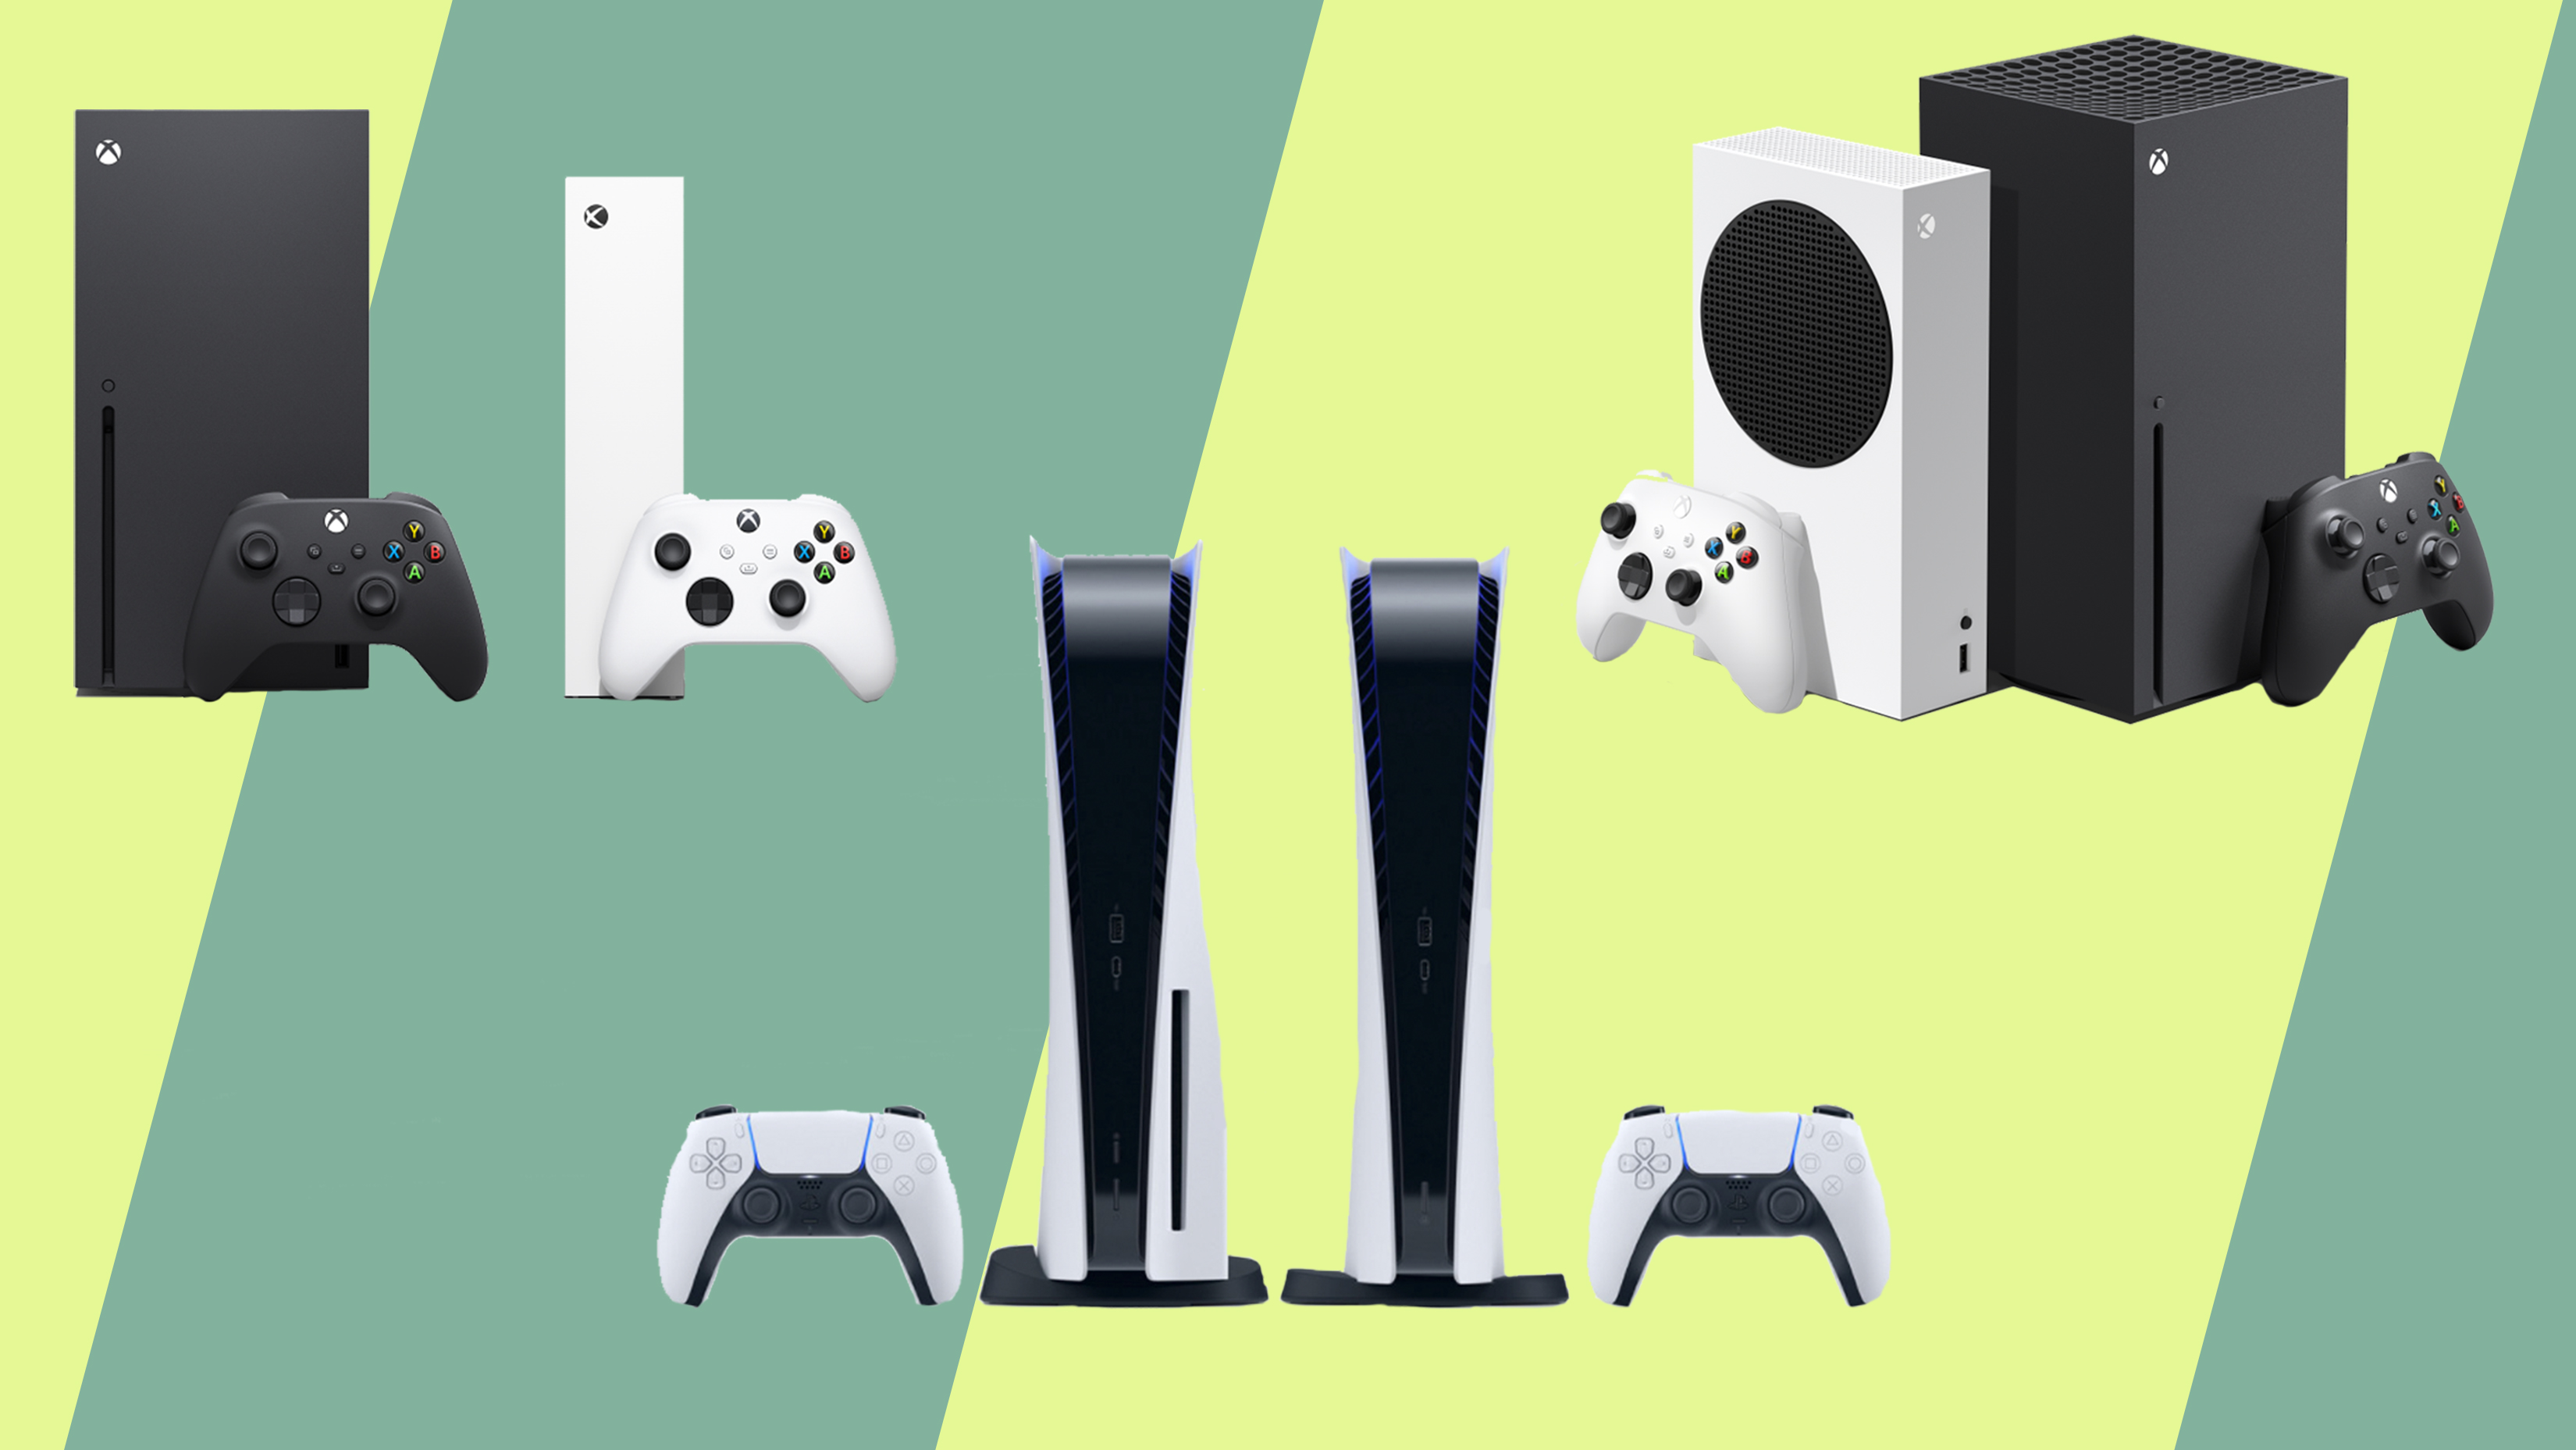 Playstation 5 Vs Xbox Series X Cnn Underscored